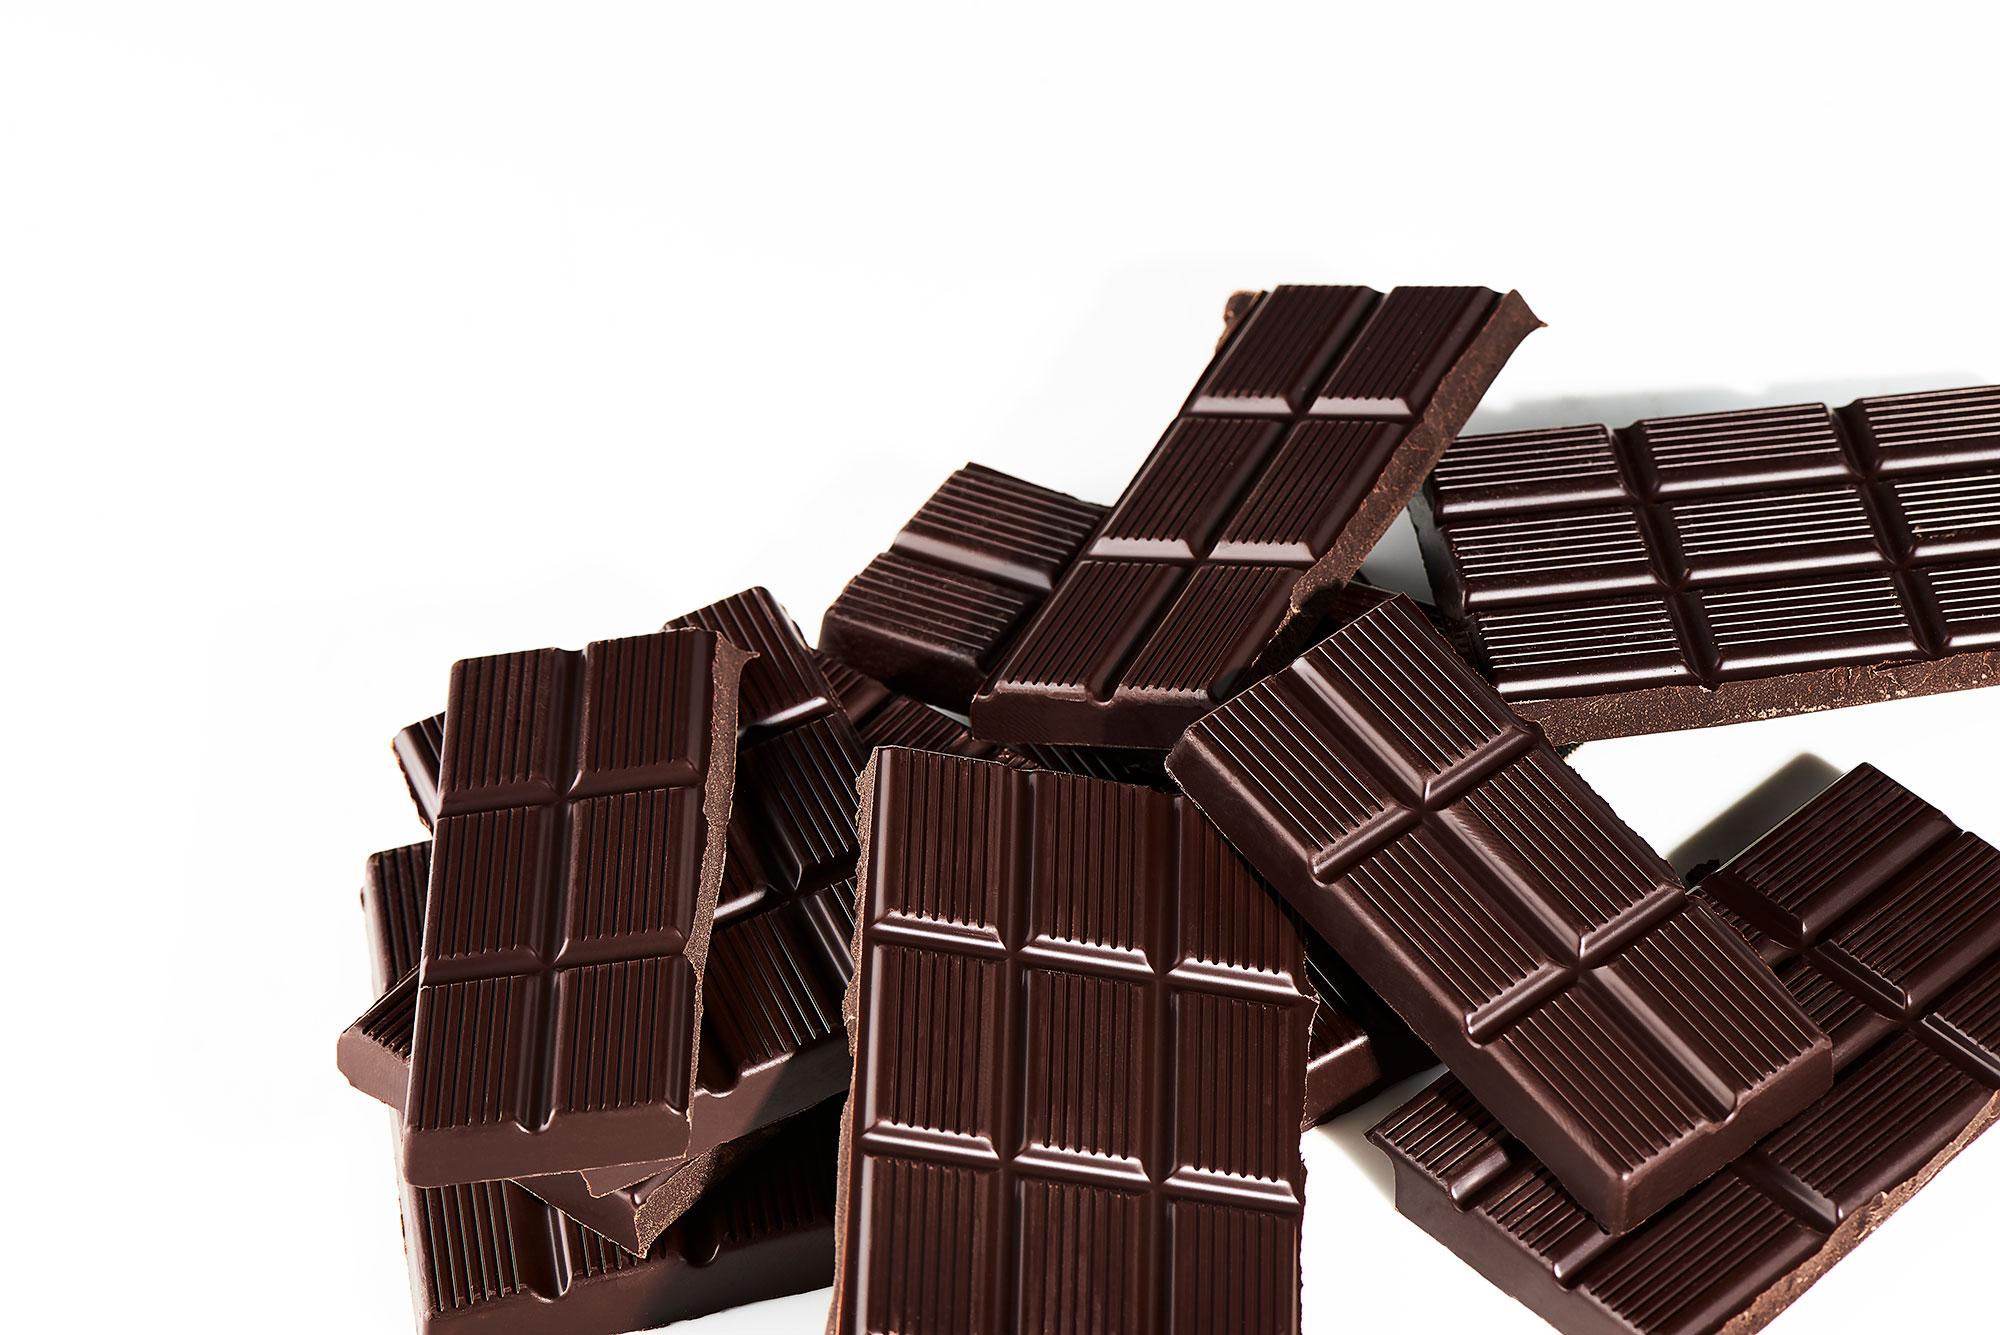 WEB CHOCOLATE BARS